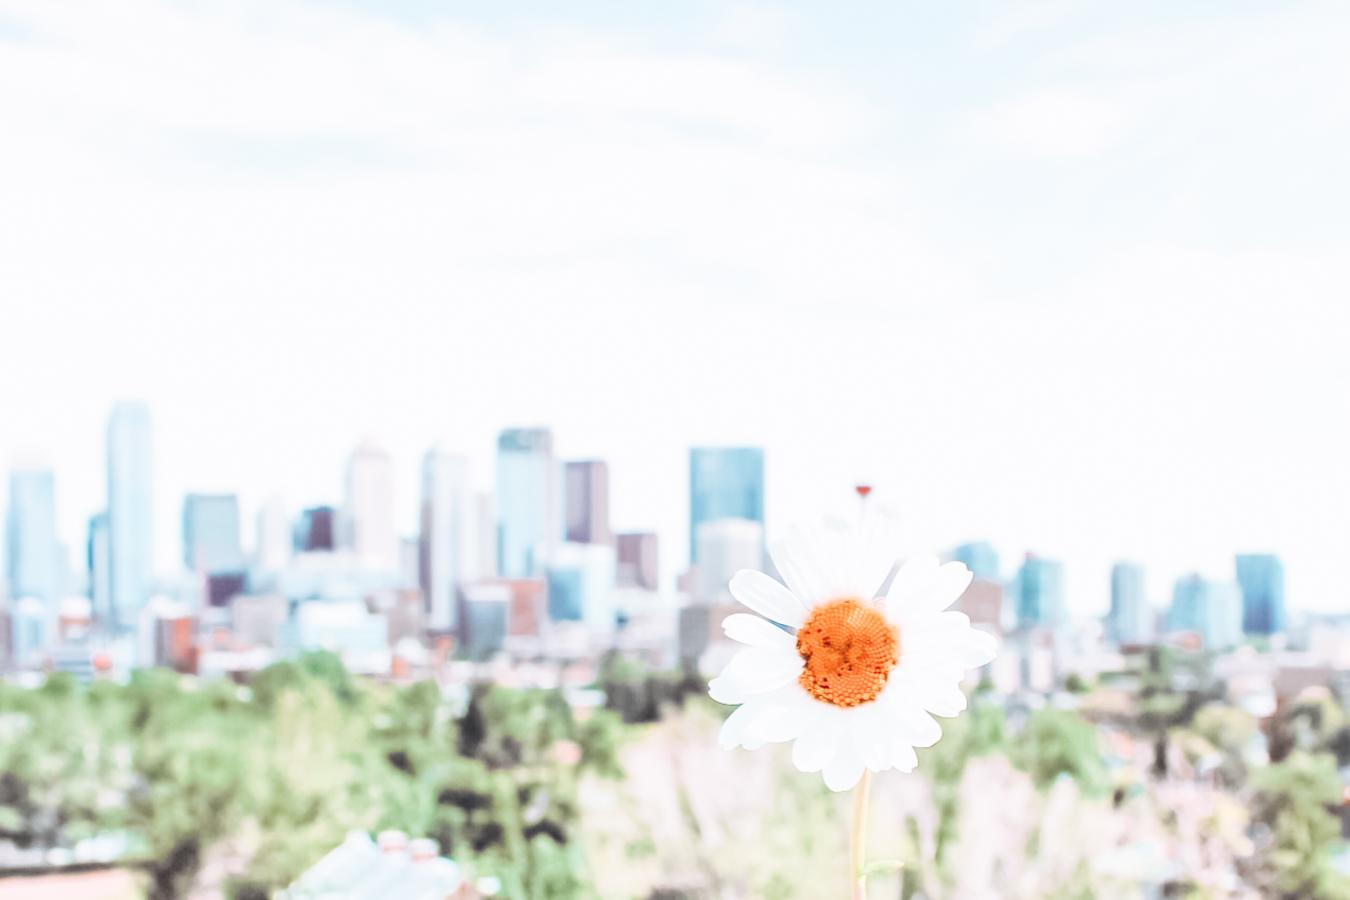 Flower and buildings in Calgary